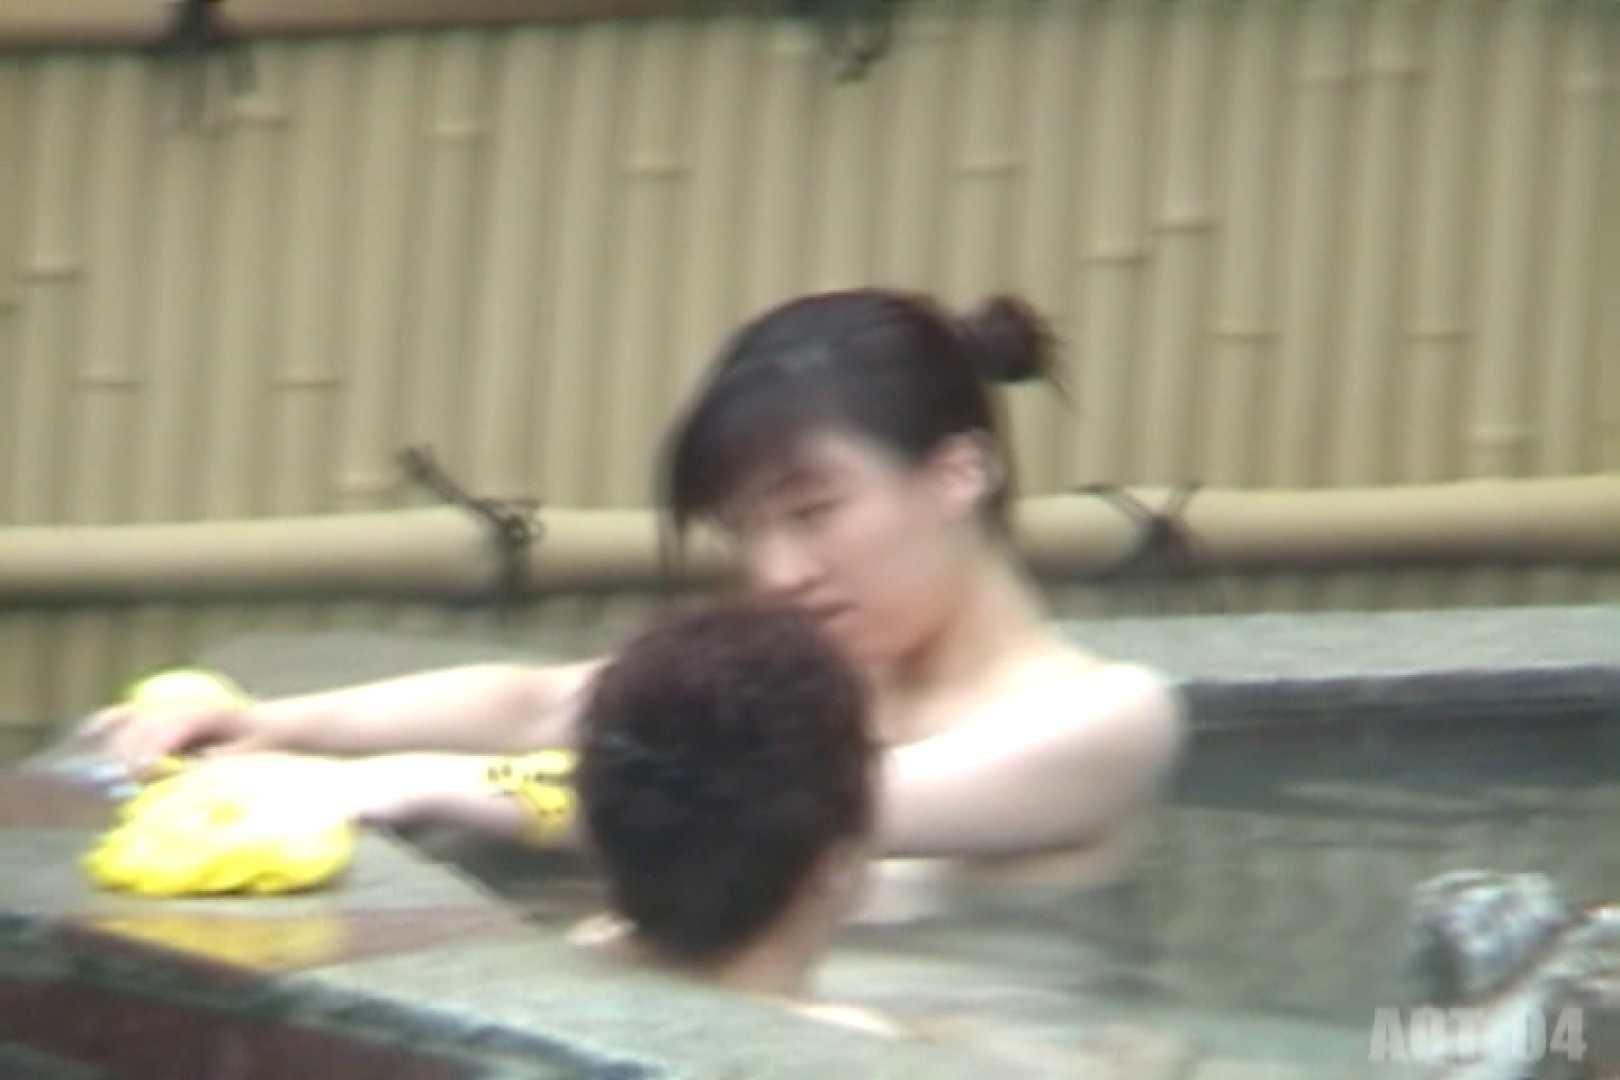 Aquaな露天風呂Vol.743 盗撮師作品 オマンコ無修正動画無料 91pic 62